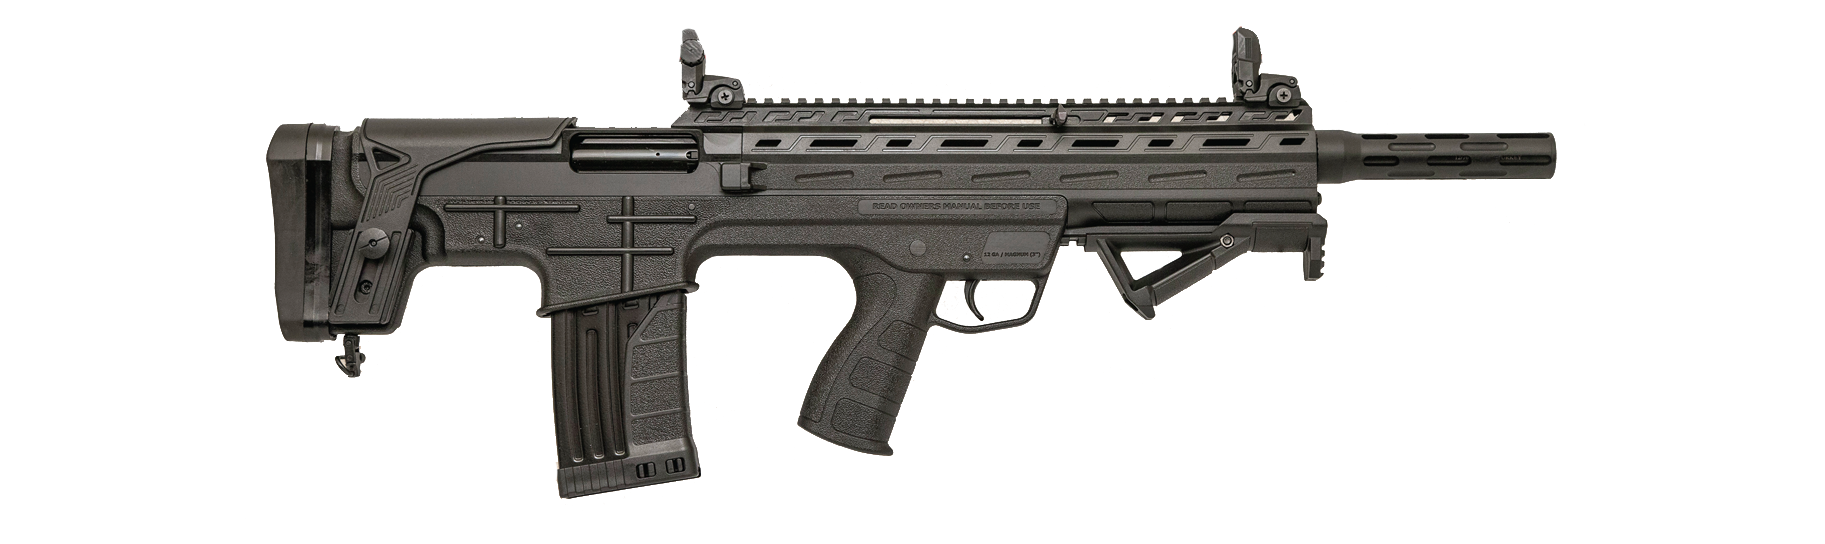 SG-105